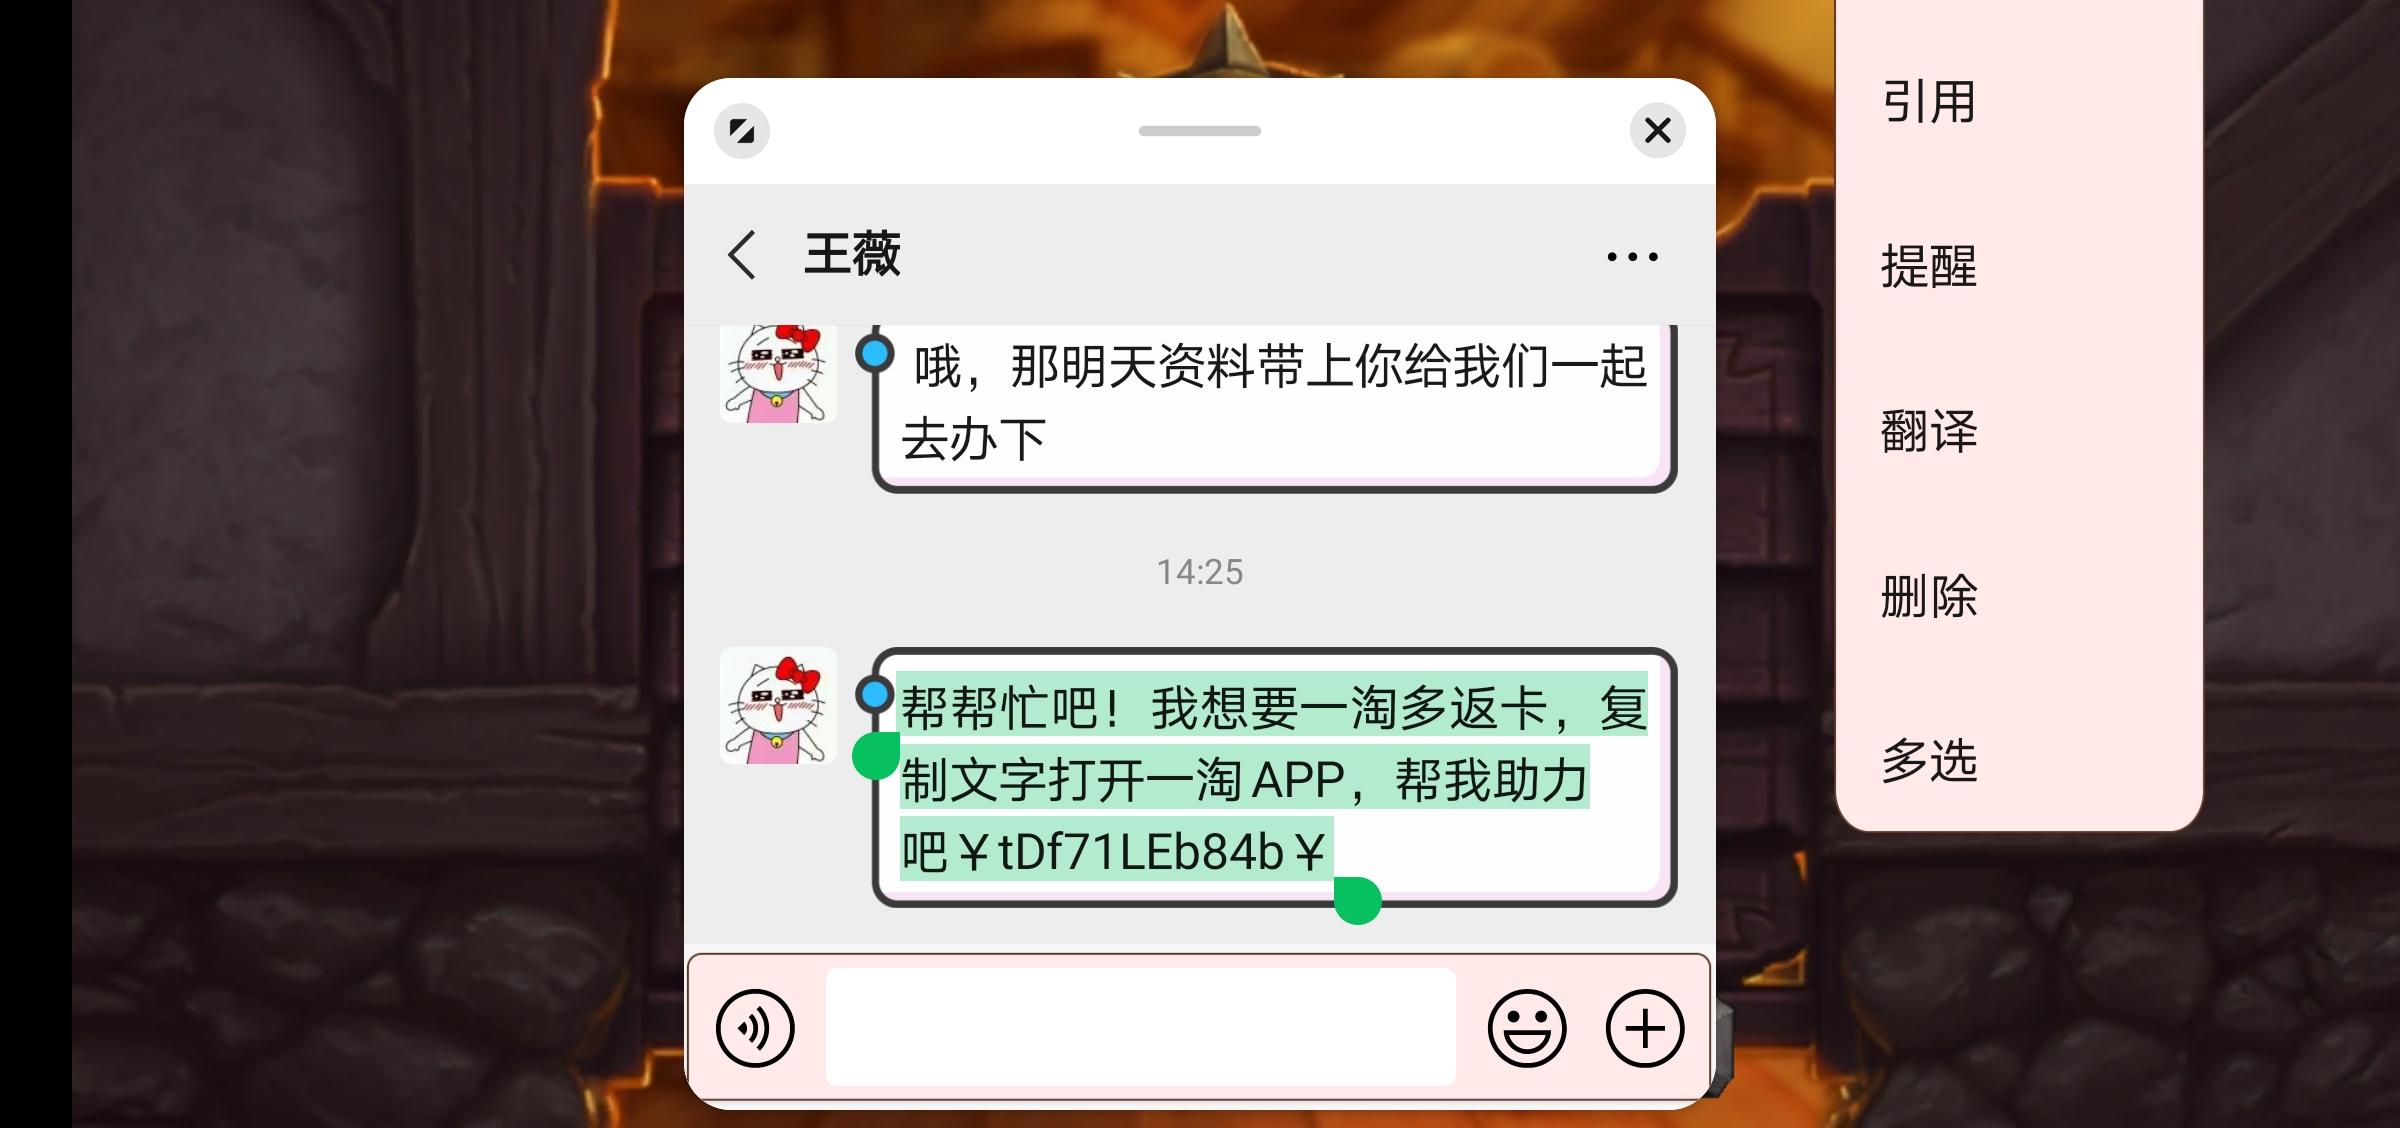 Screenshot_20200513_142622_com.tencent.mm.jpg